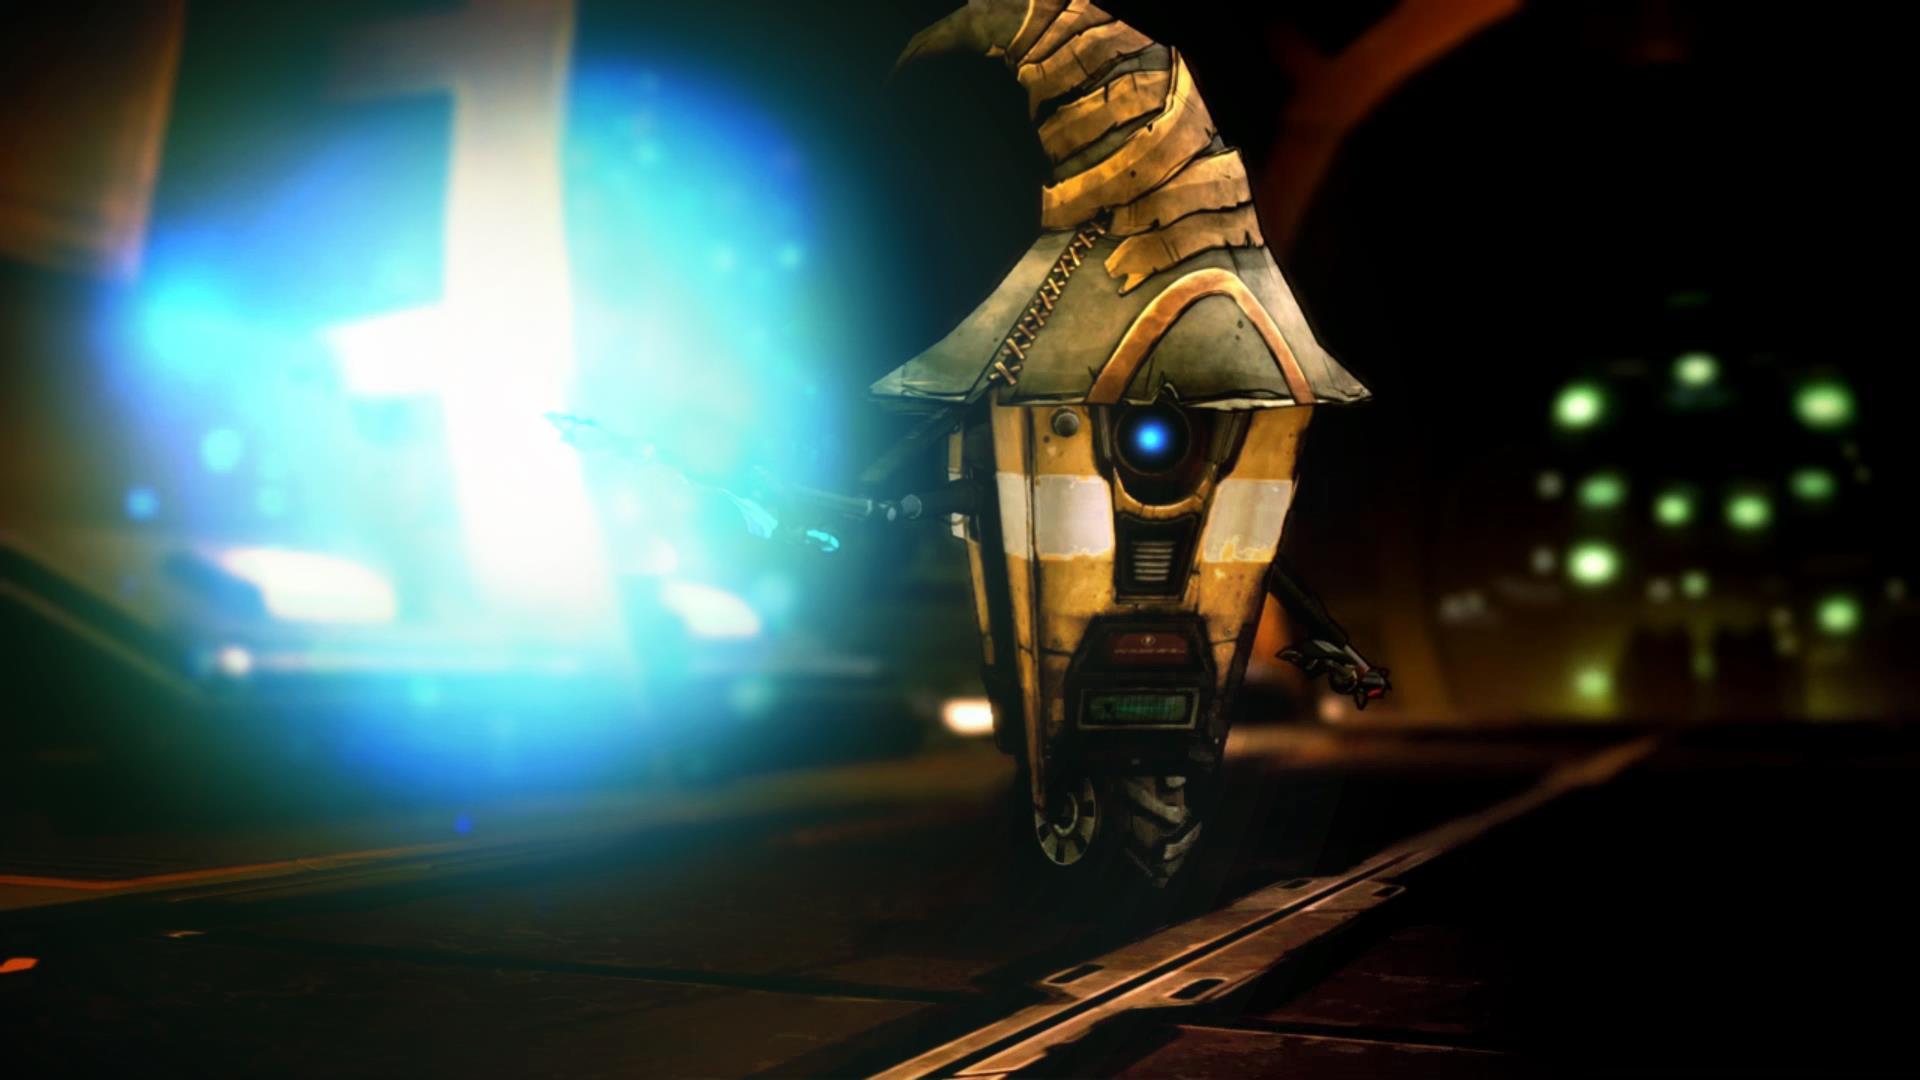 Image for US PSN sale includes Rocket League, Borderlands, Far Cry 4, plus a 10% off code